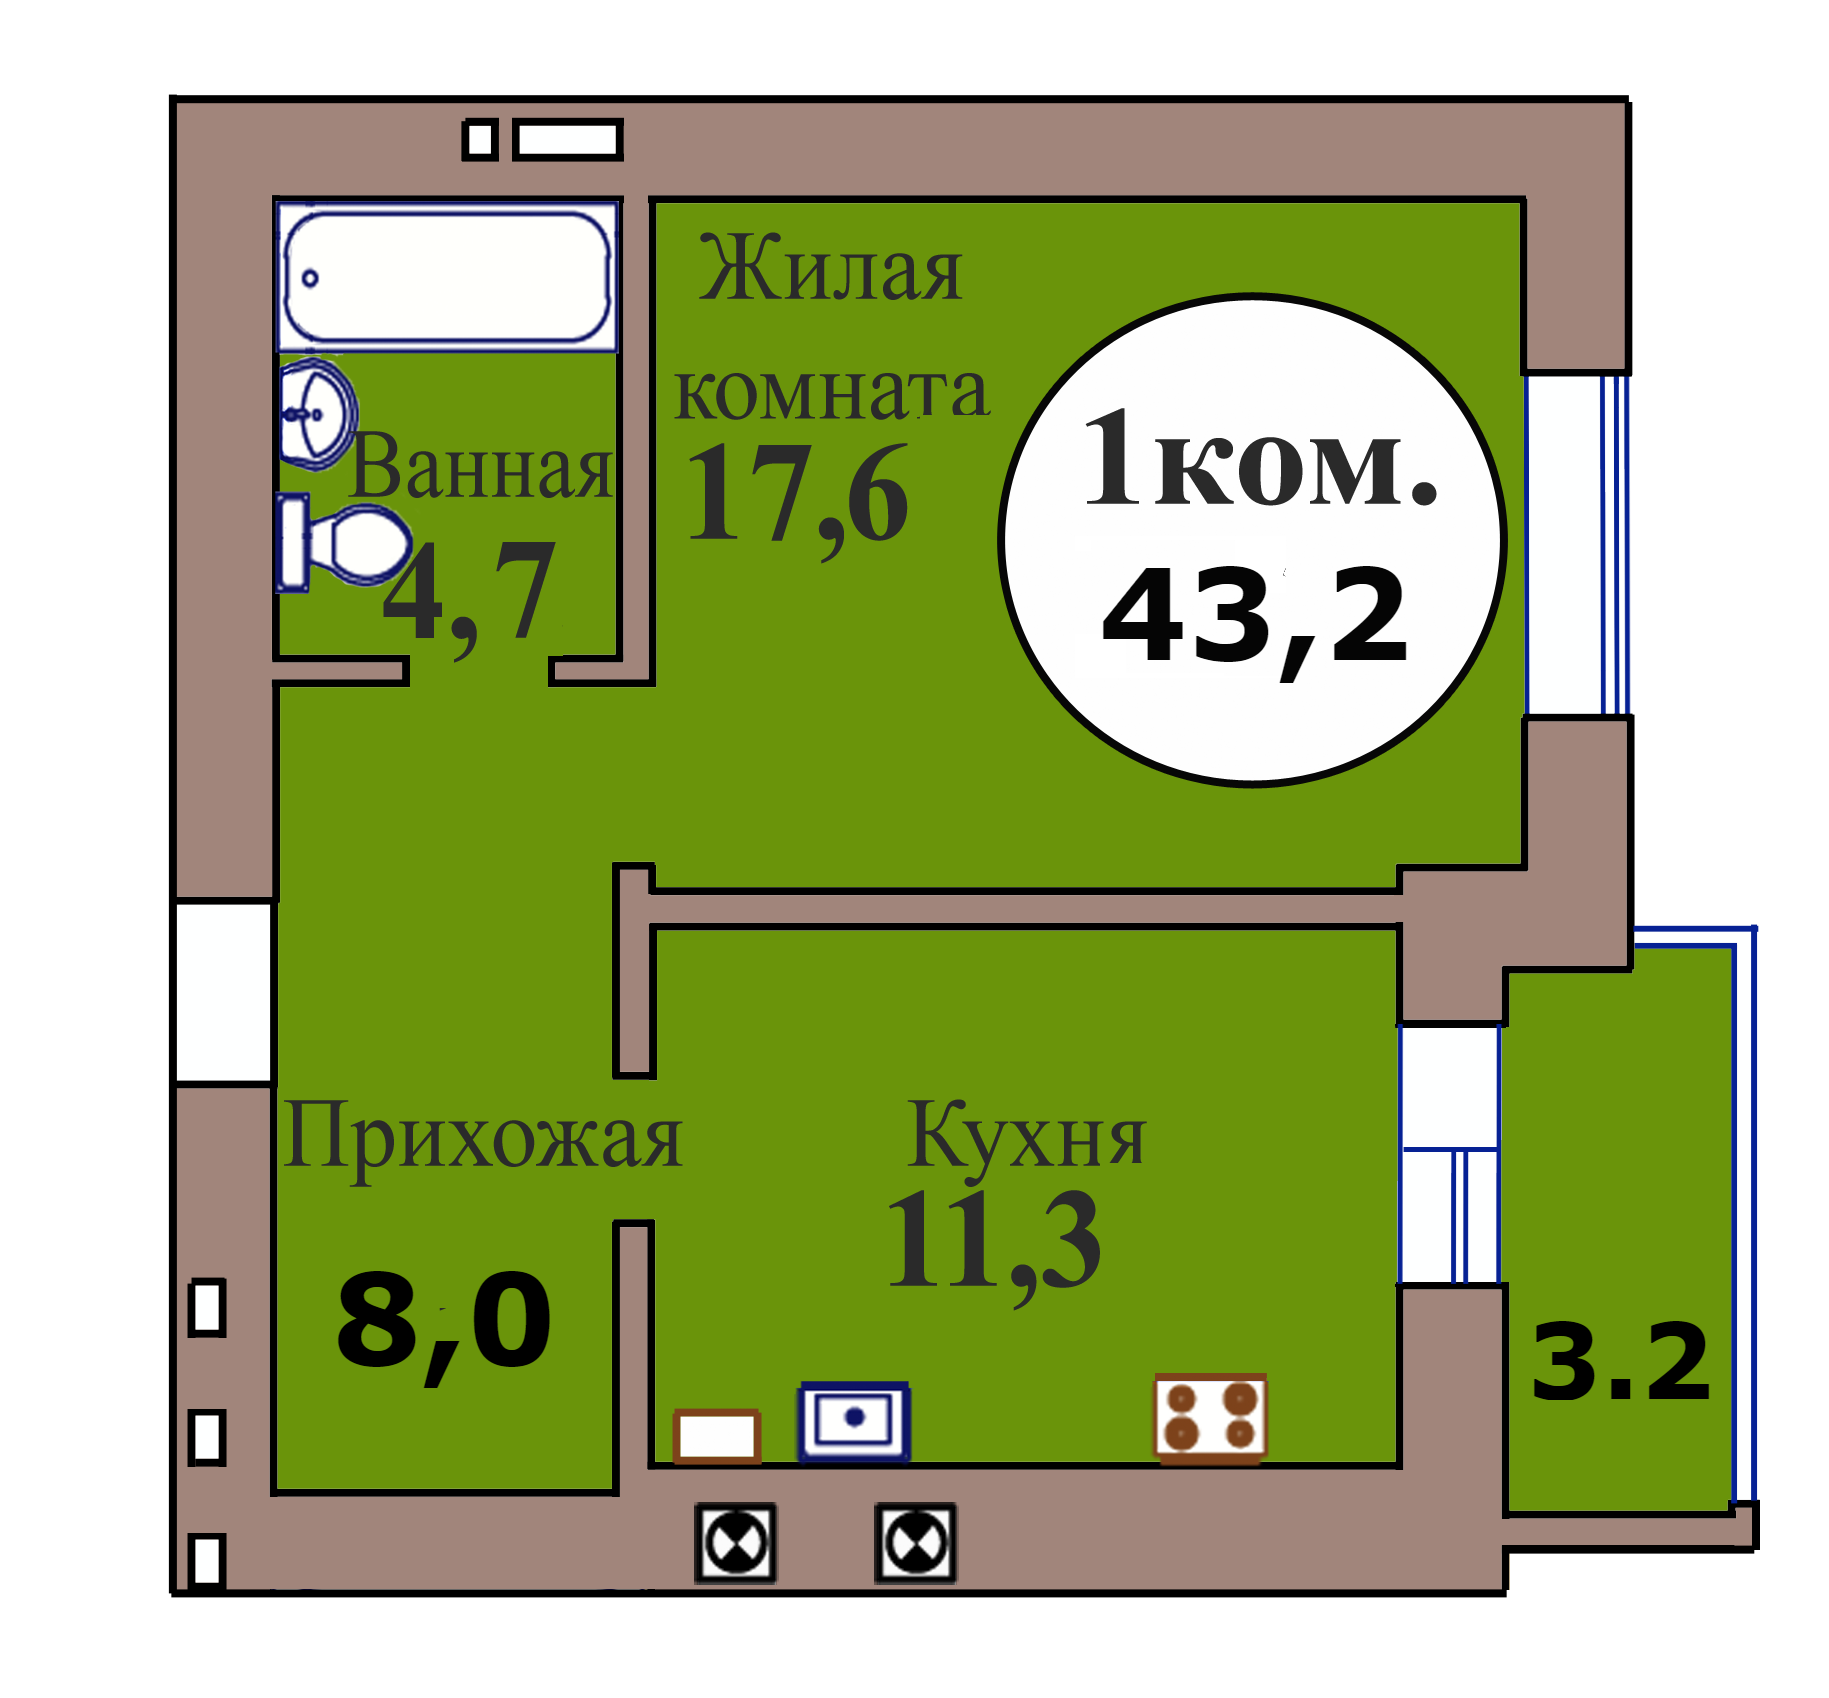 1-комн. кв. по пер. Калининградский, 5 кв. 147 в Калининграде